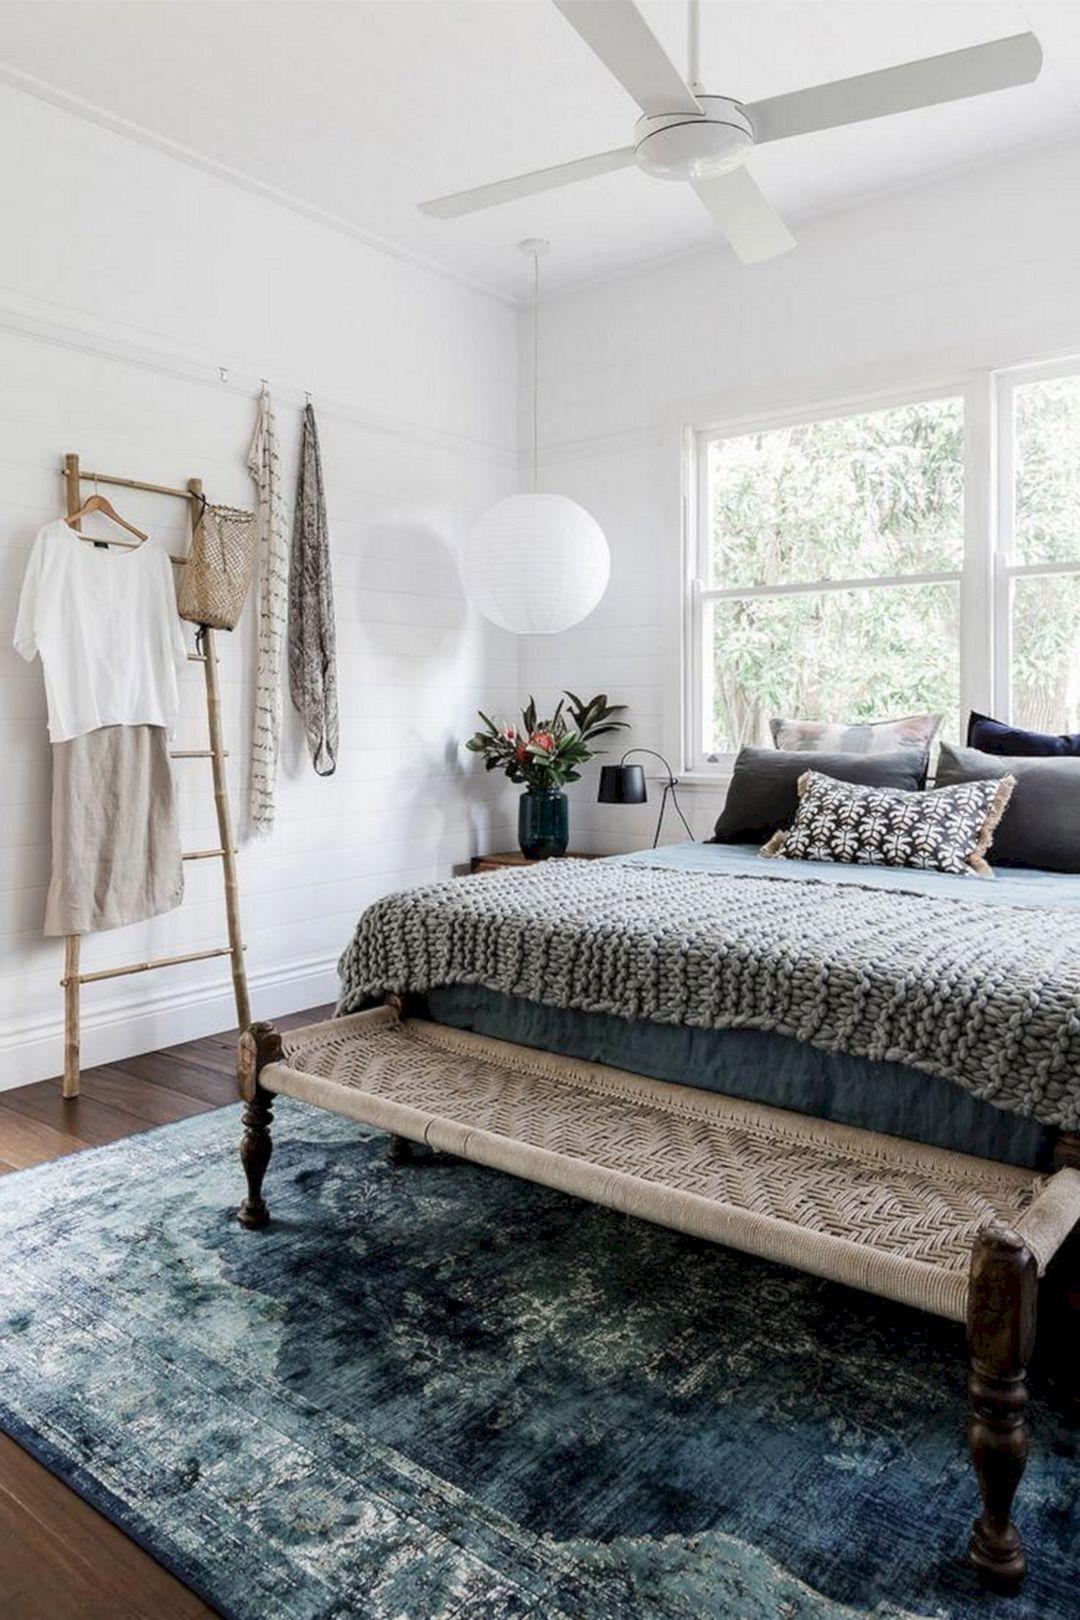 20 Wonderful Bohemian Minimalist Bedroom Ideas You Have To